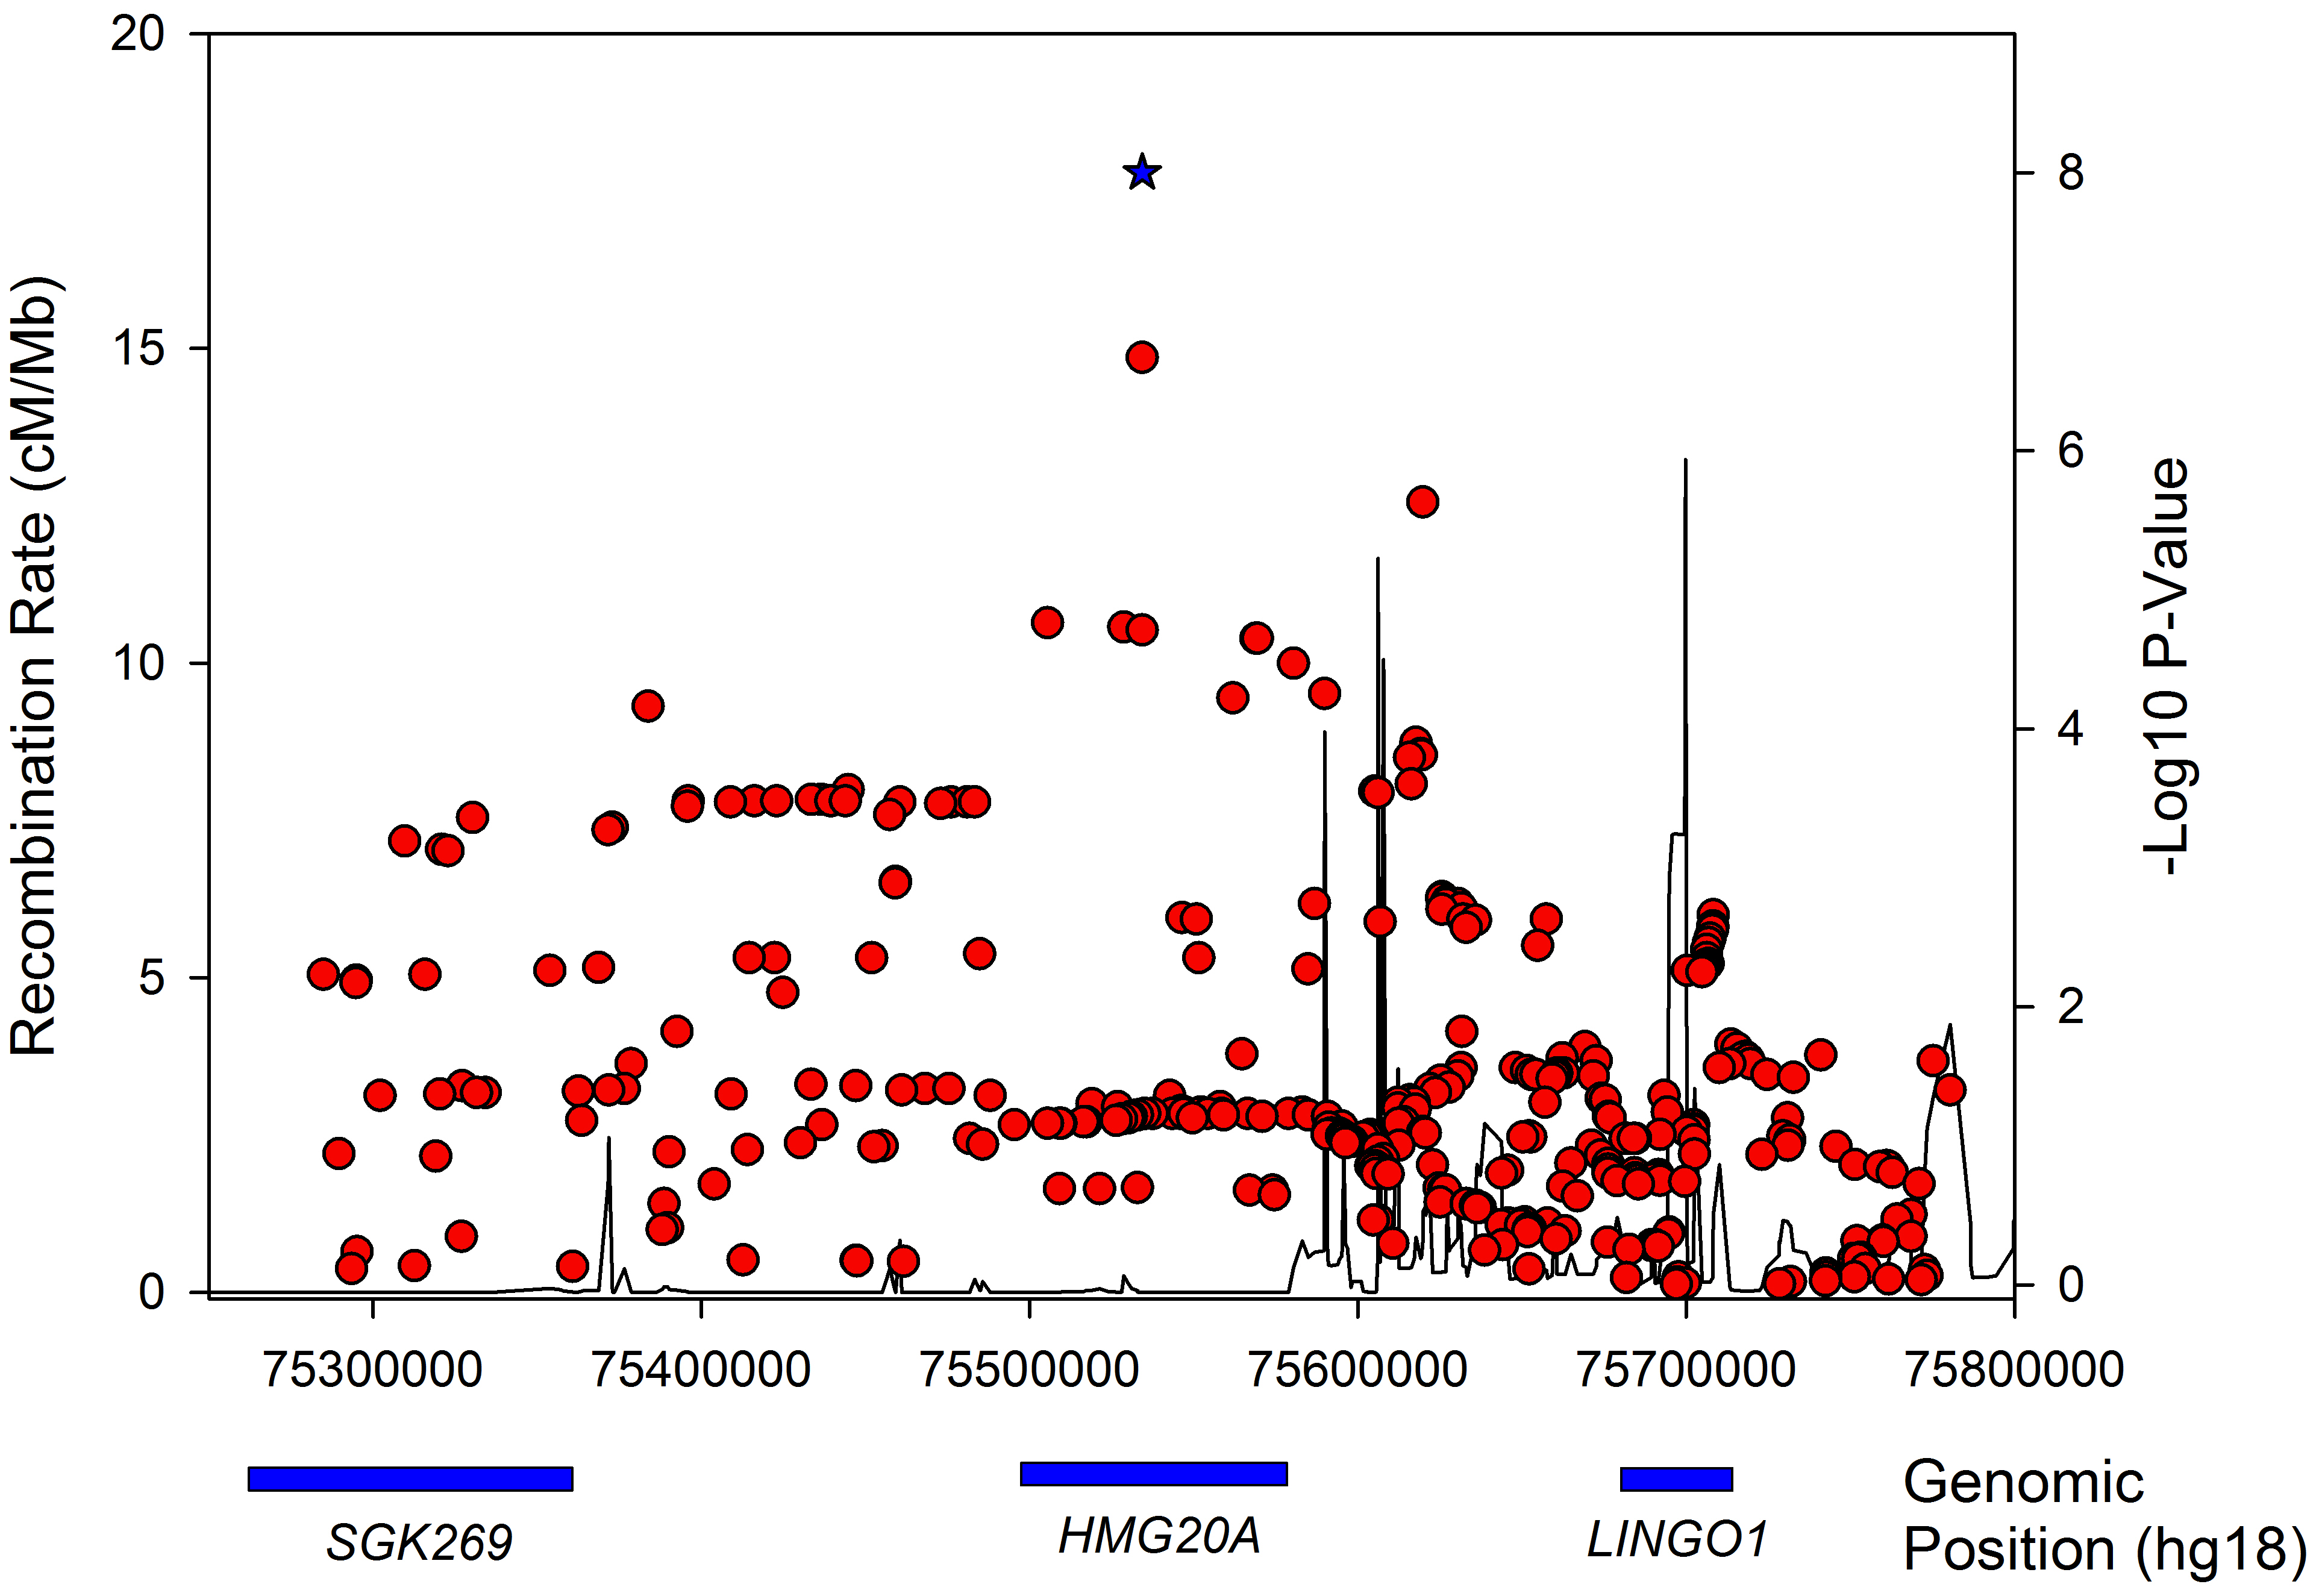 Regional association plot for the <i>HMG20A</i> gene in obese type 2 diabetes samples.